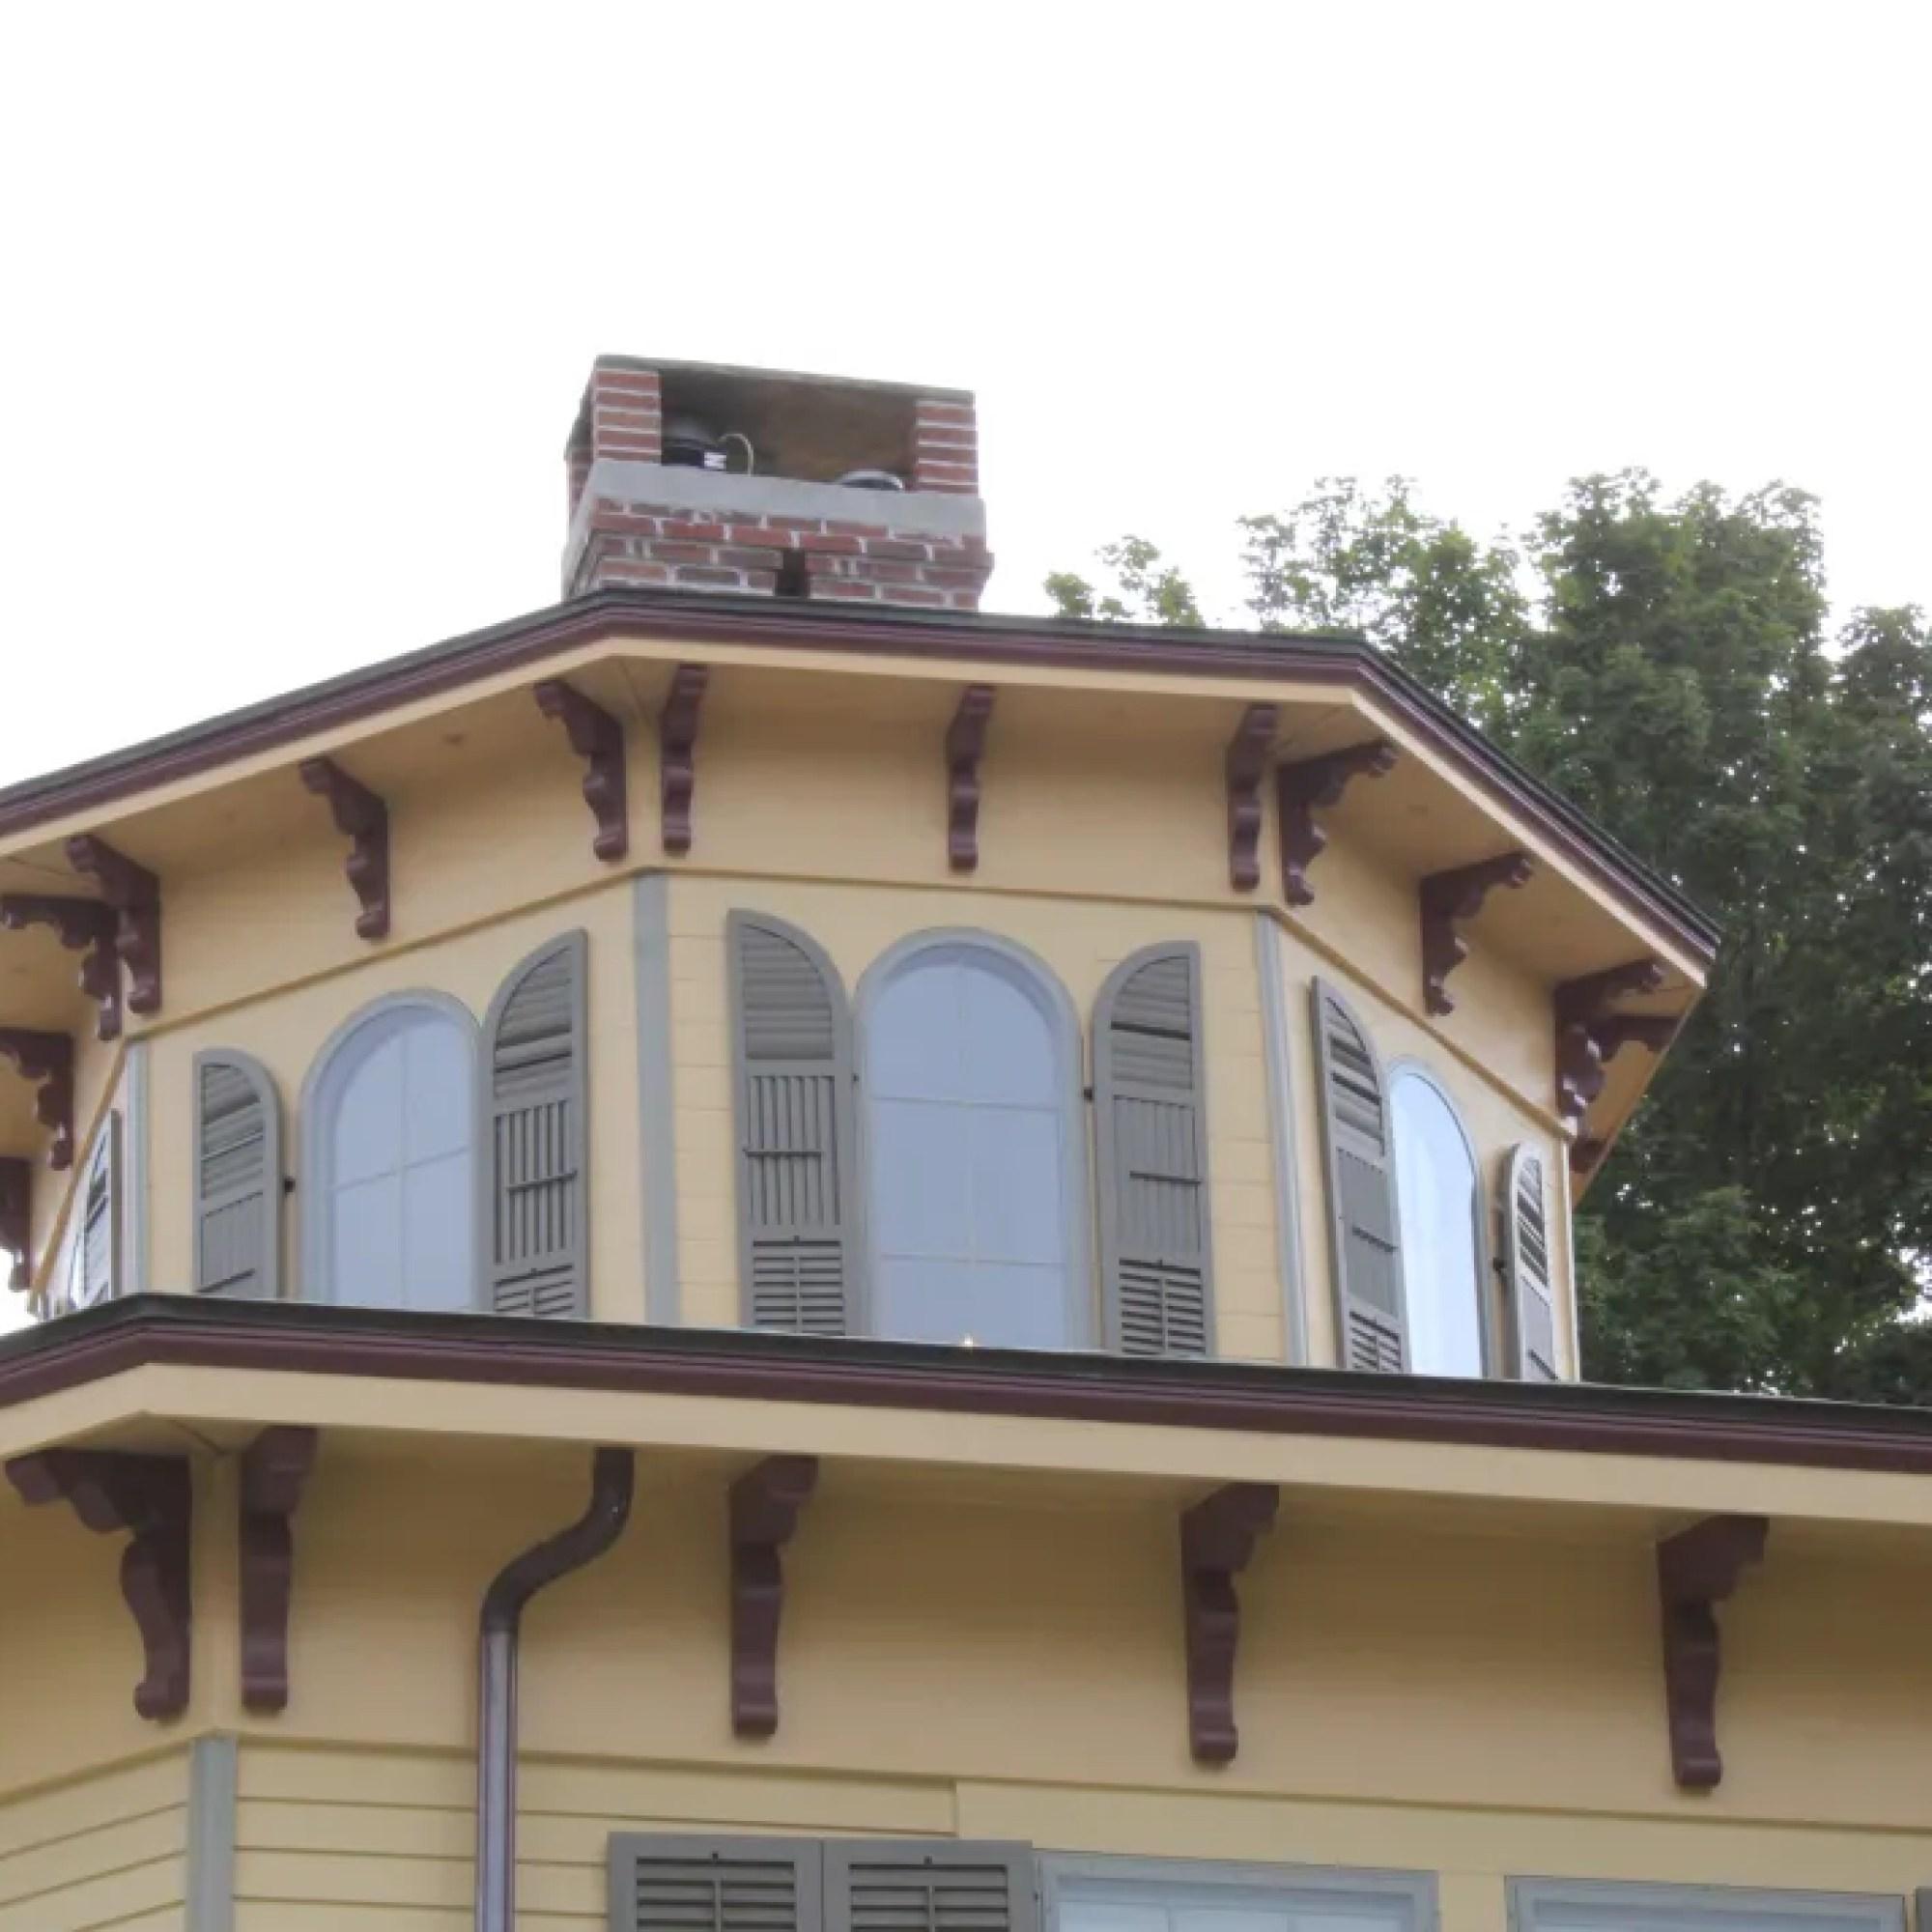 Cuploa of an octagon house